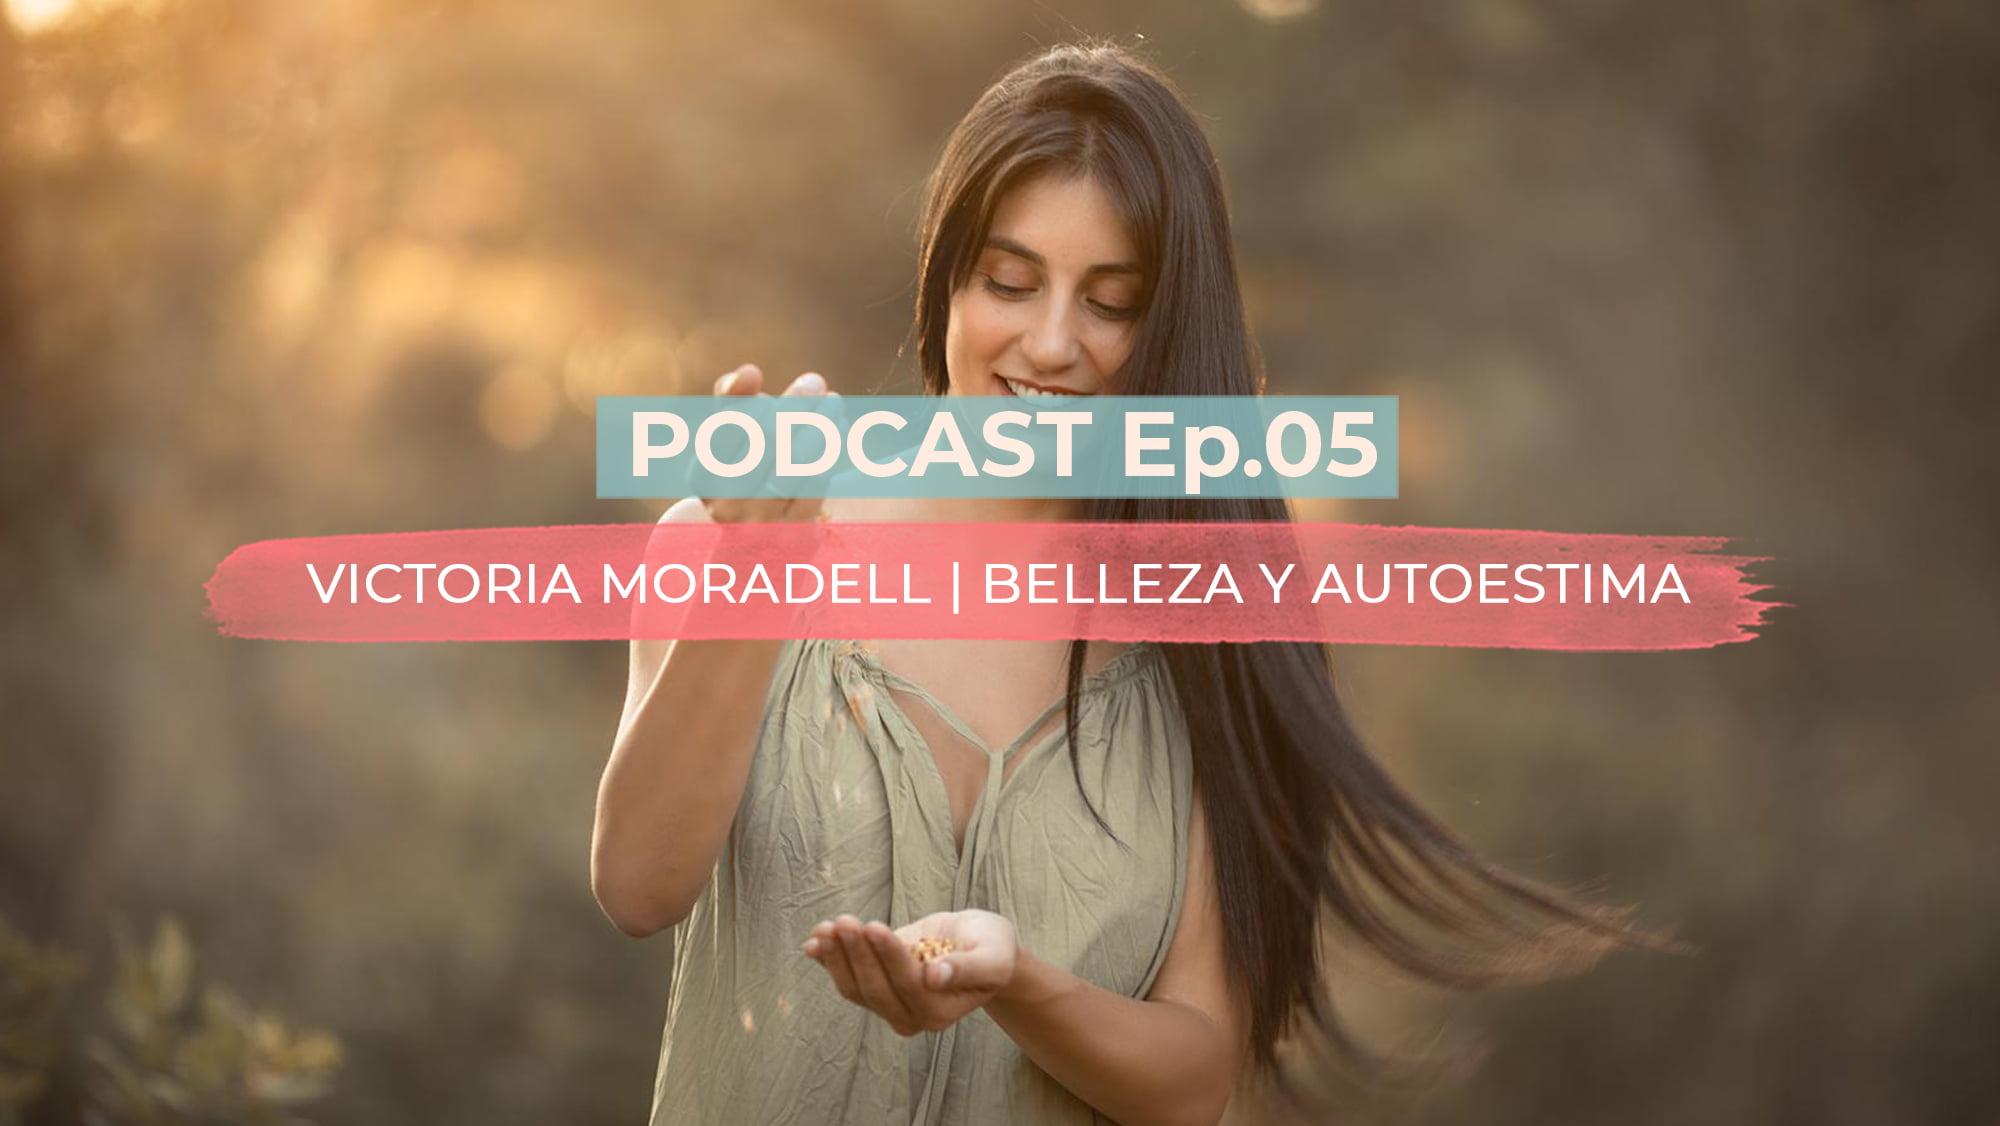 PODCAST EP. 05 | Belleza y autoestima con Victoria Moradell